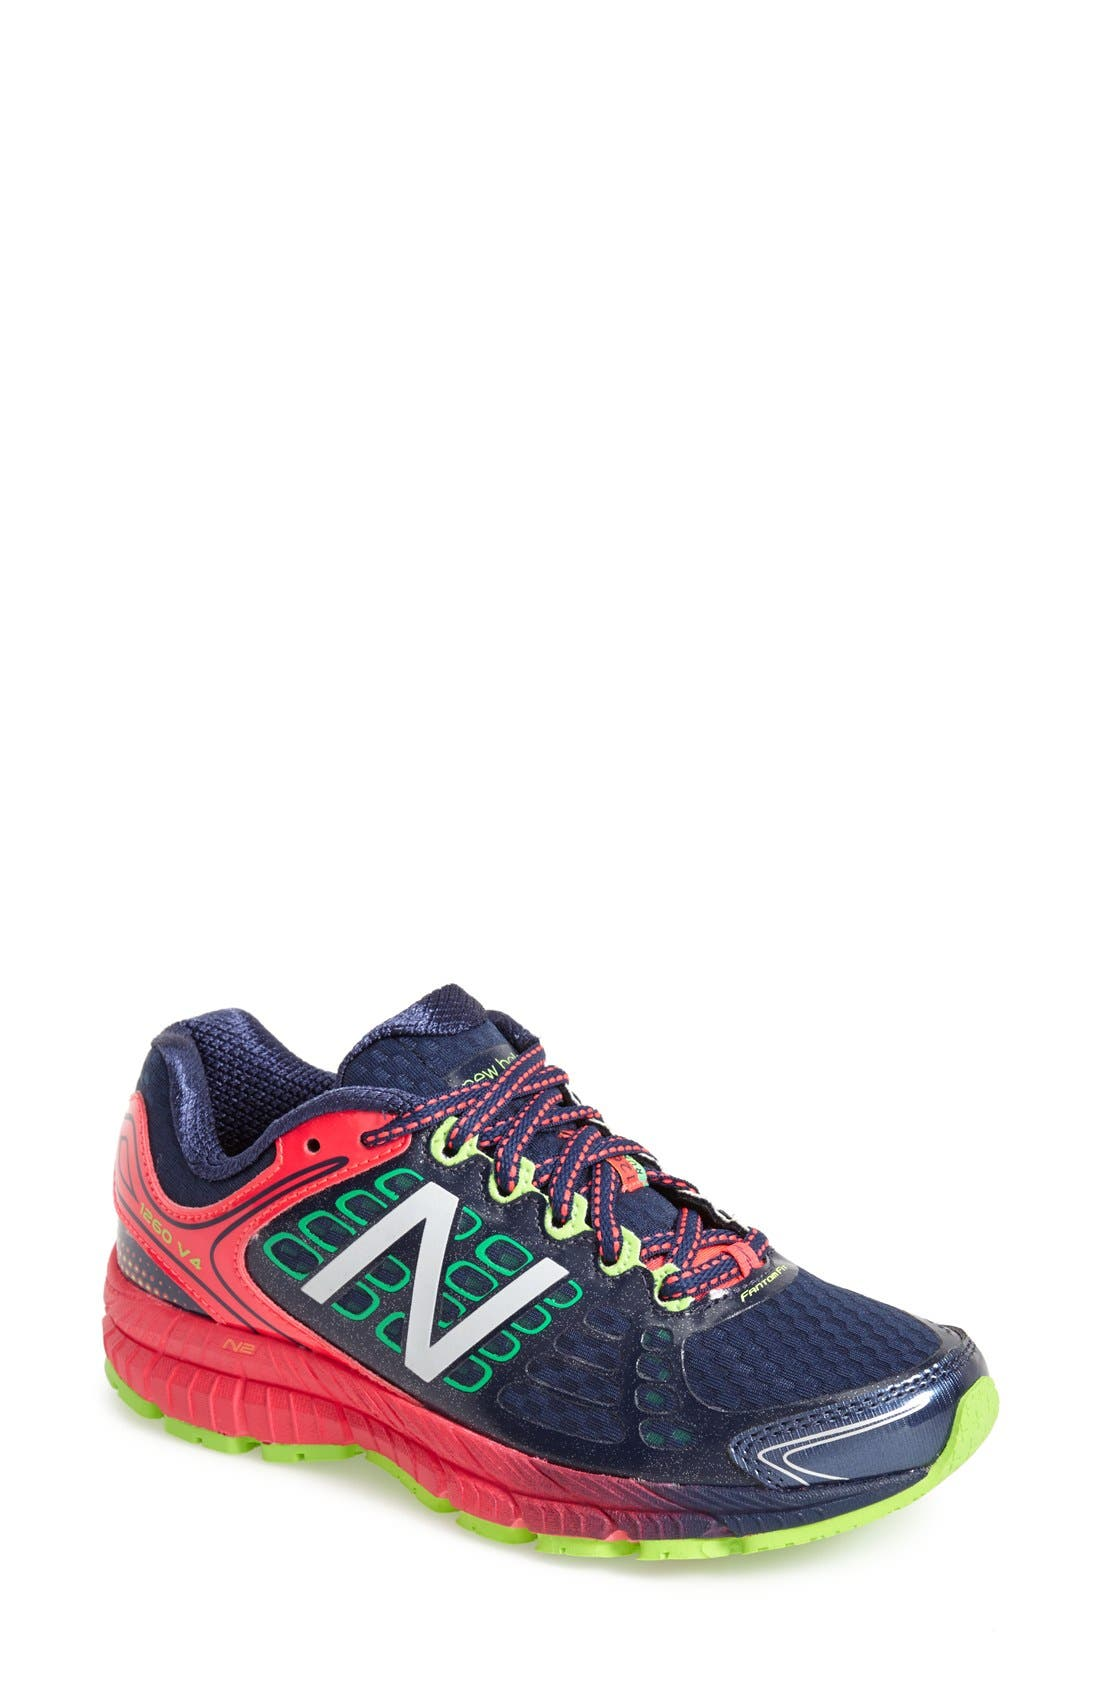 Alternate Image 1 Selected - New Balance '1260' Running Shoe (Women)